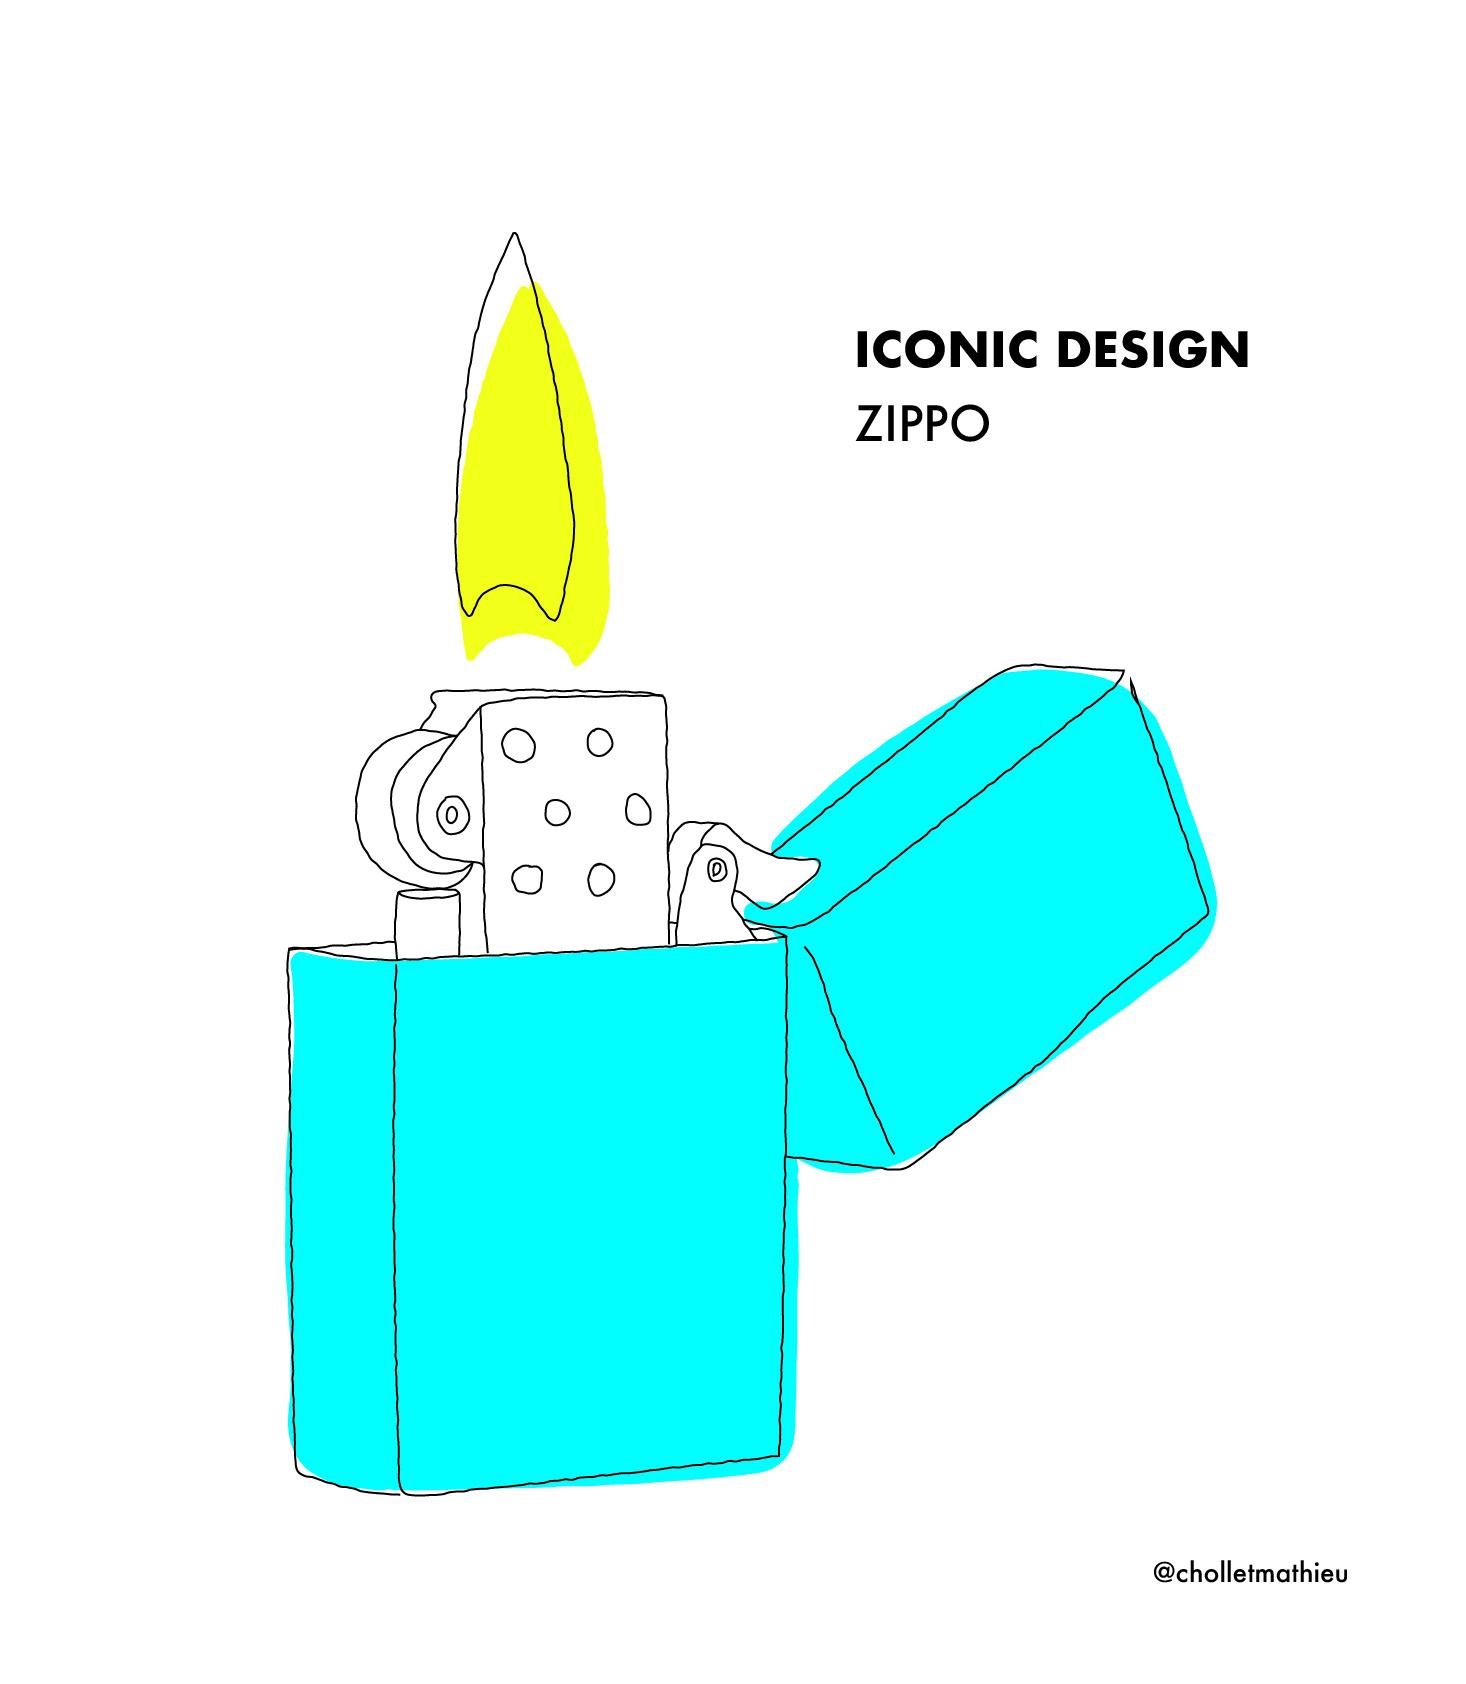 IconicDesign-1